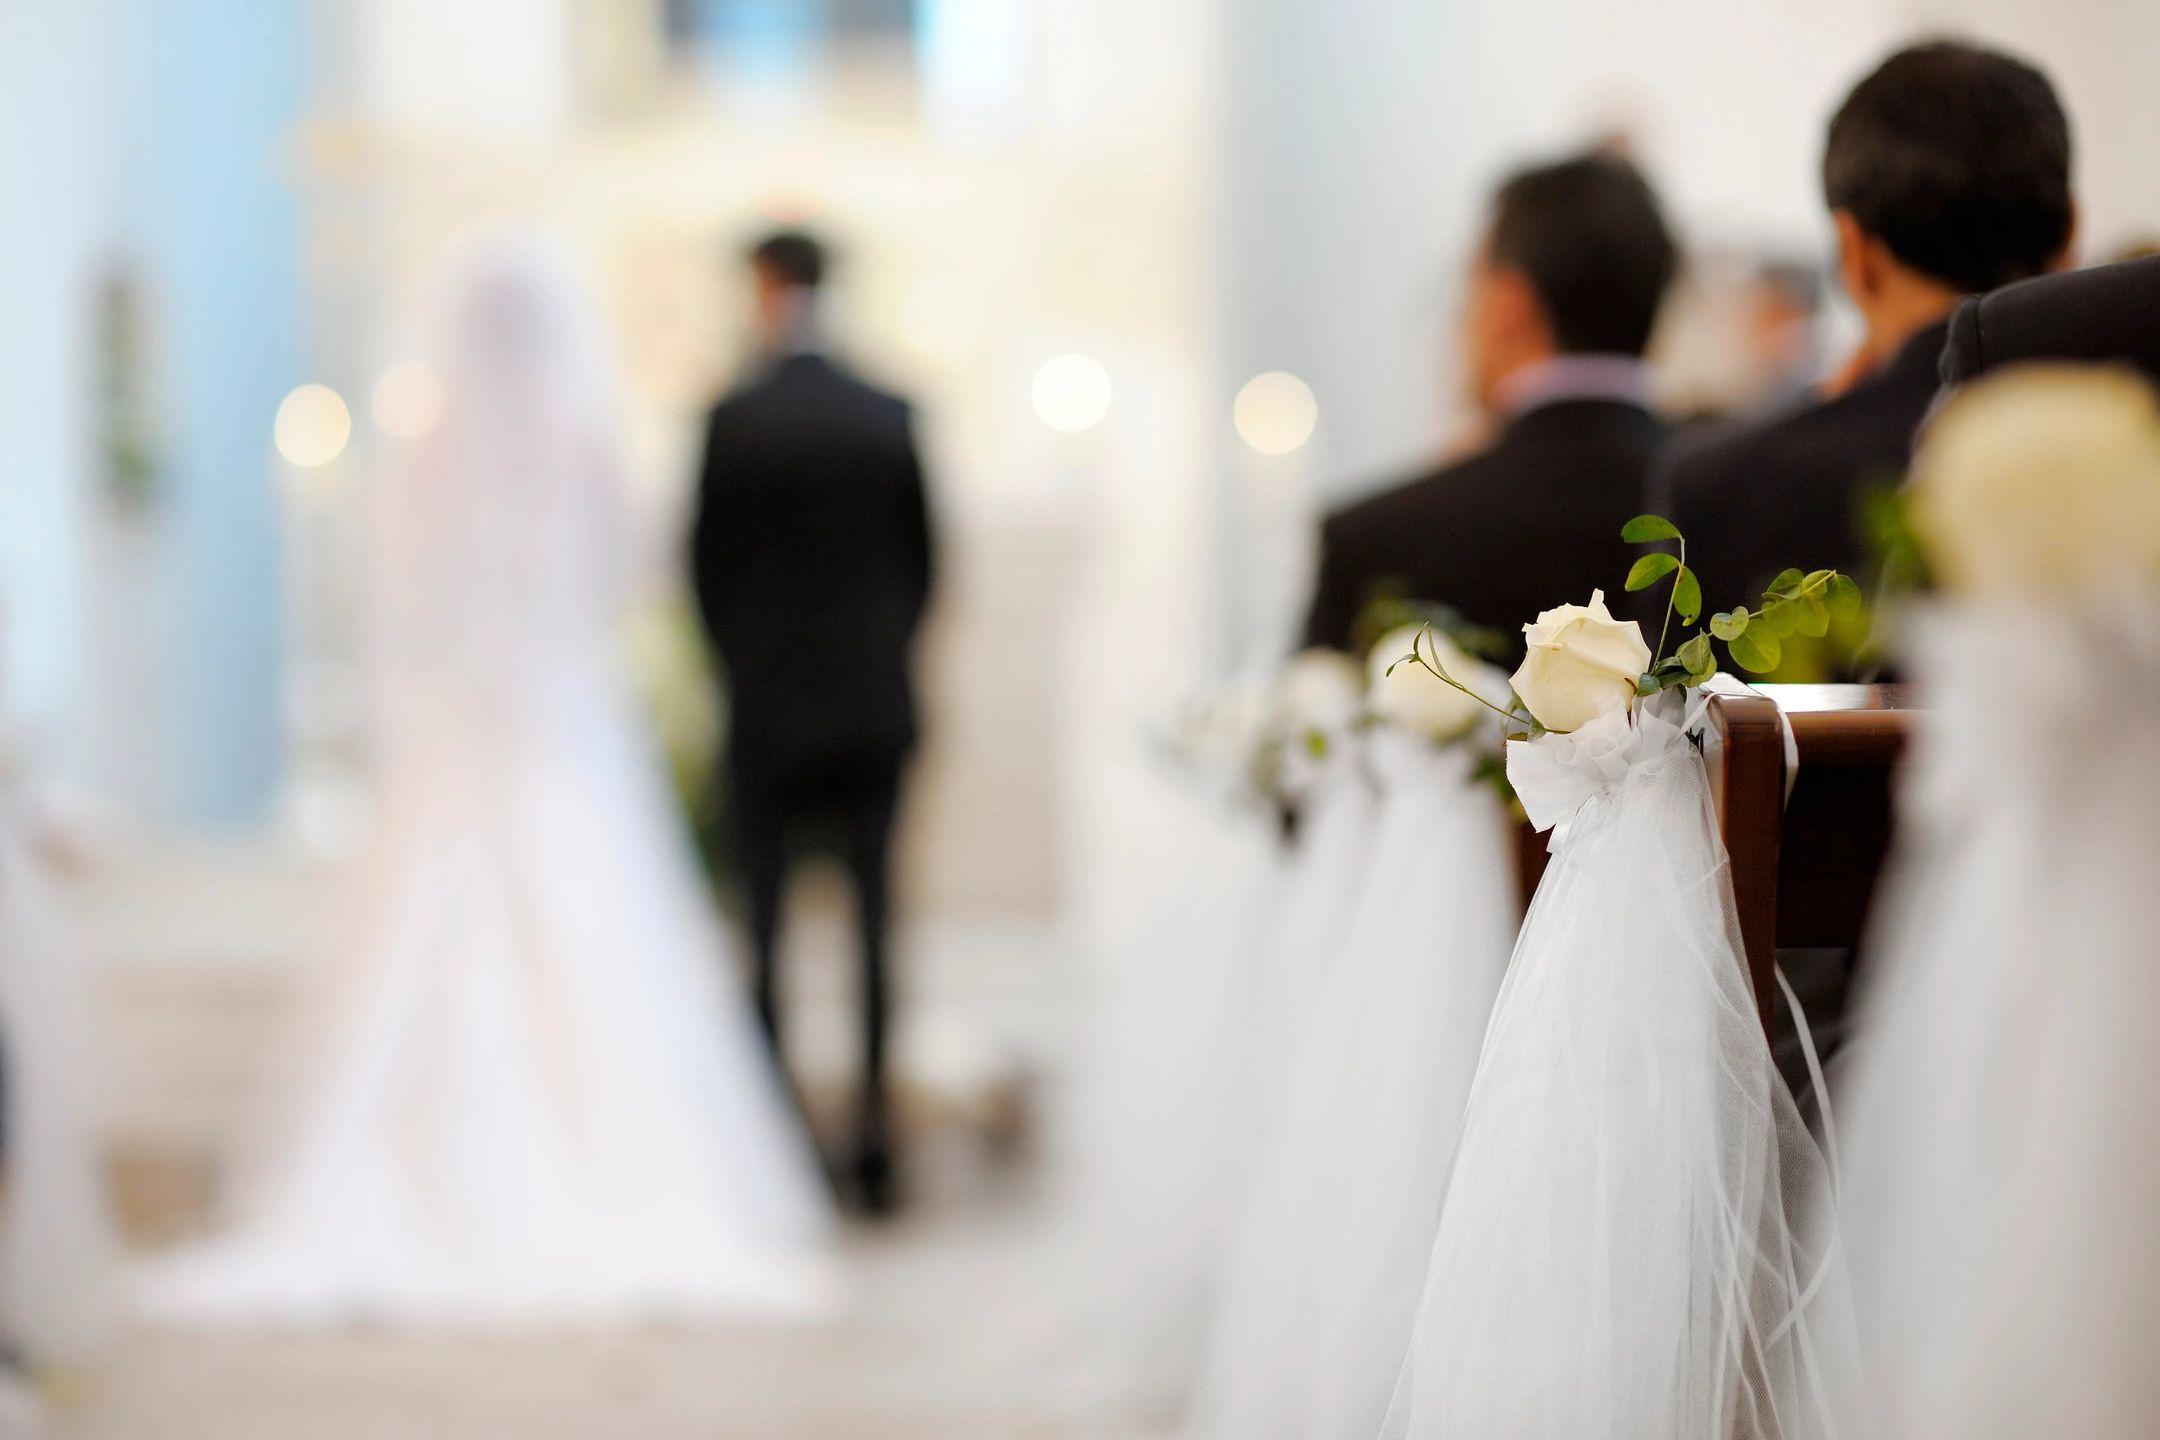 Meeting Needs in Marriage